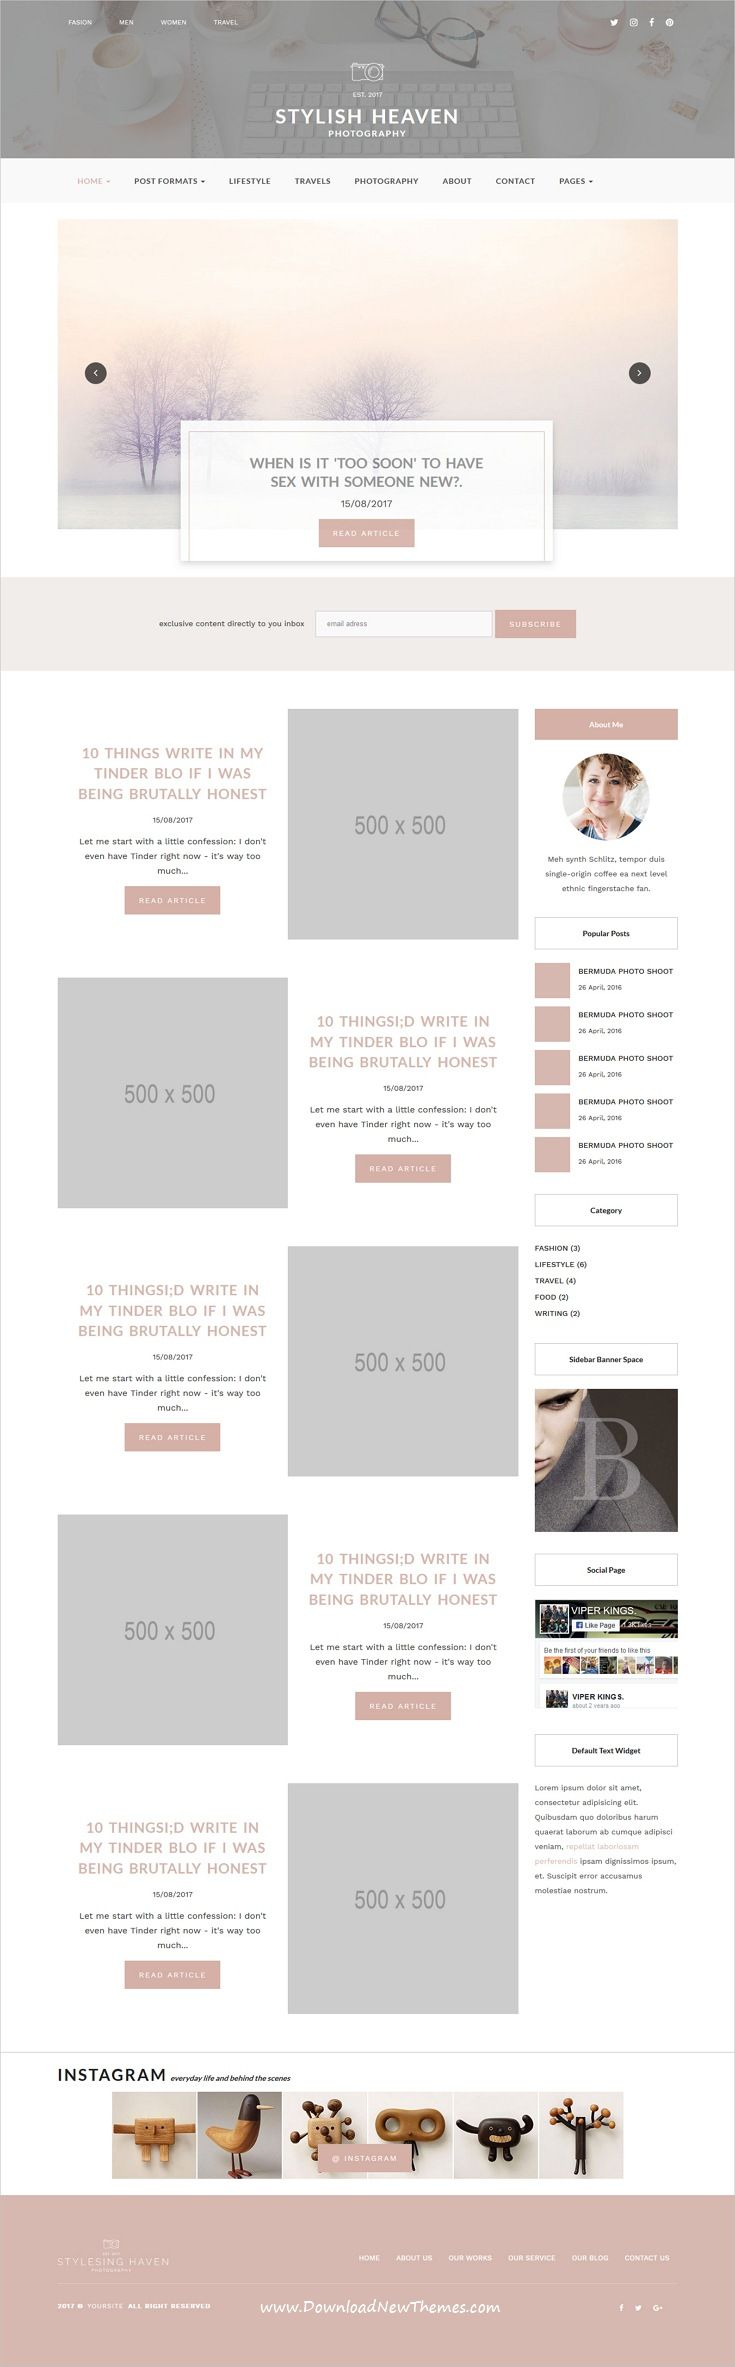 Stylish Heaven - Personal Blog - HTML Template | Template